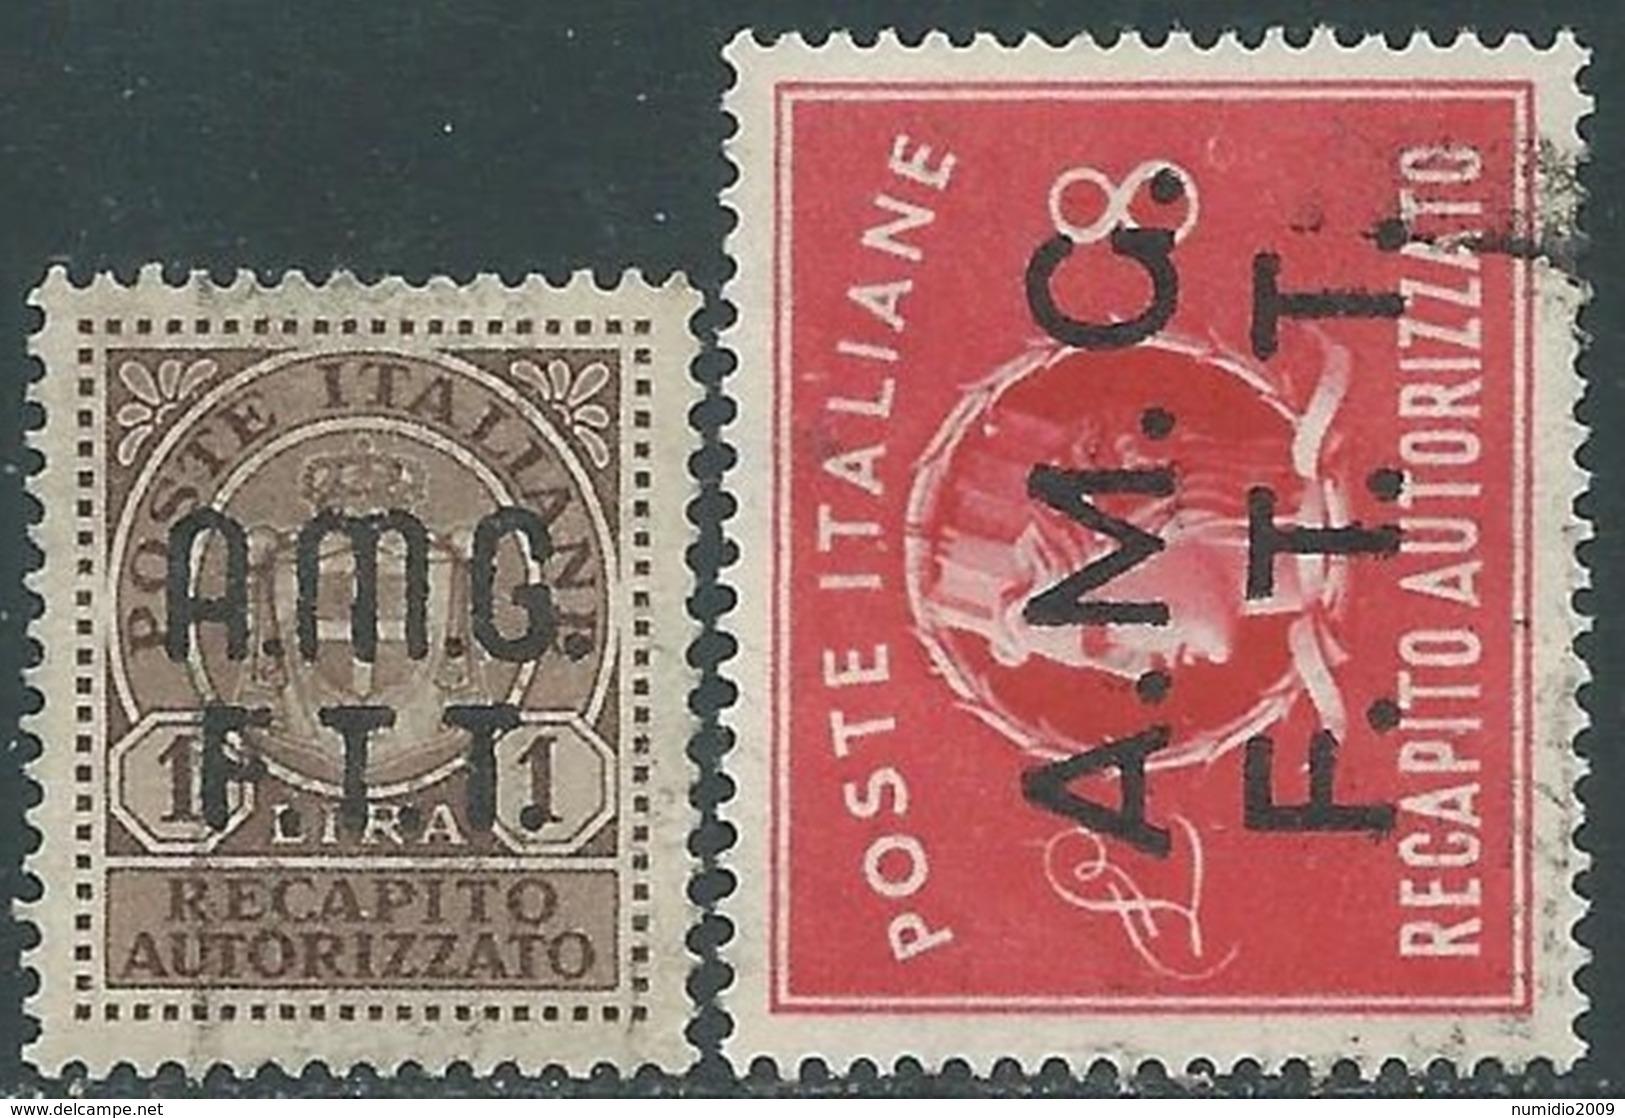 1947 TRIESTE A RECAPITO AUTORIZZATO USATO 2 VALORI - RA28-2 - Eilsendung (Eilpost)